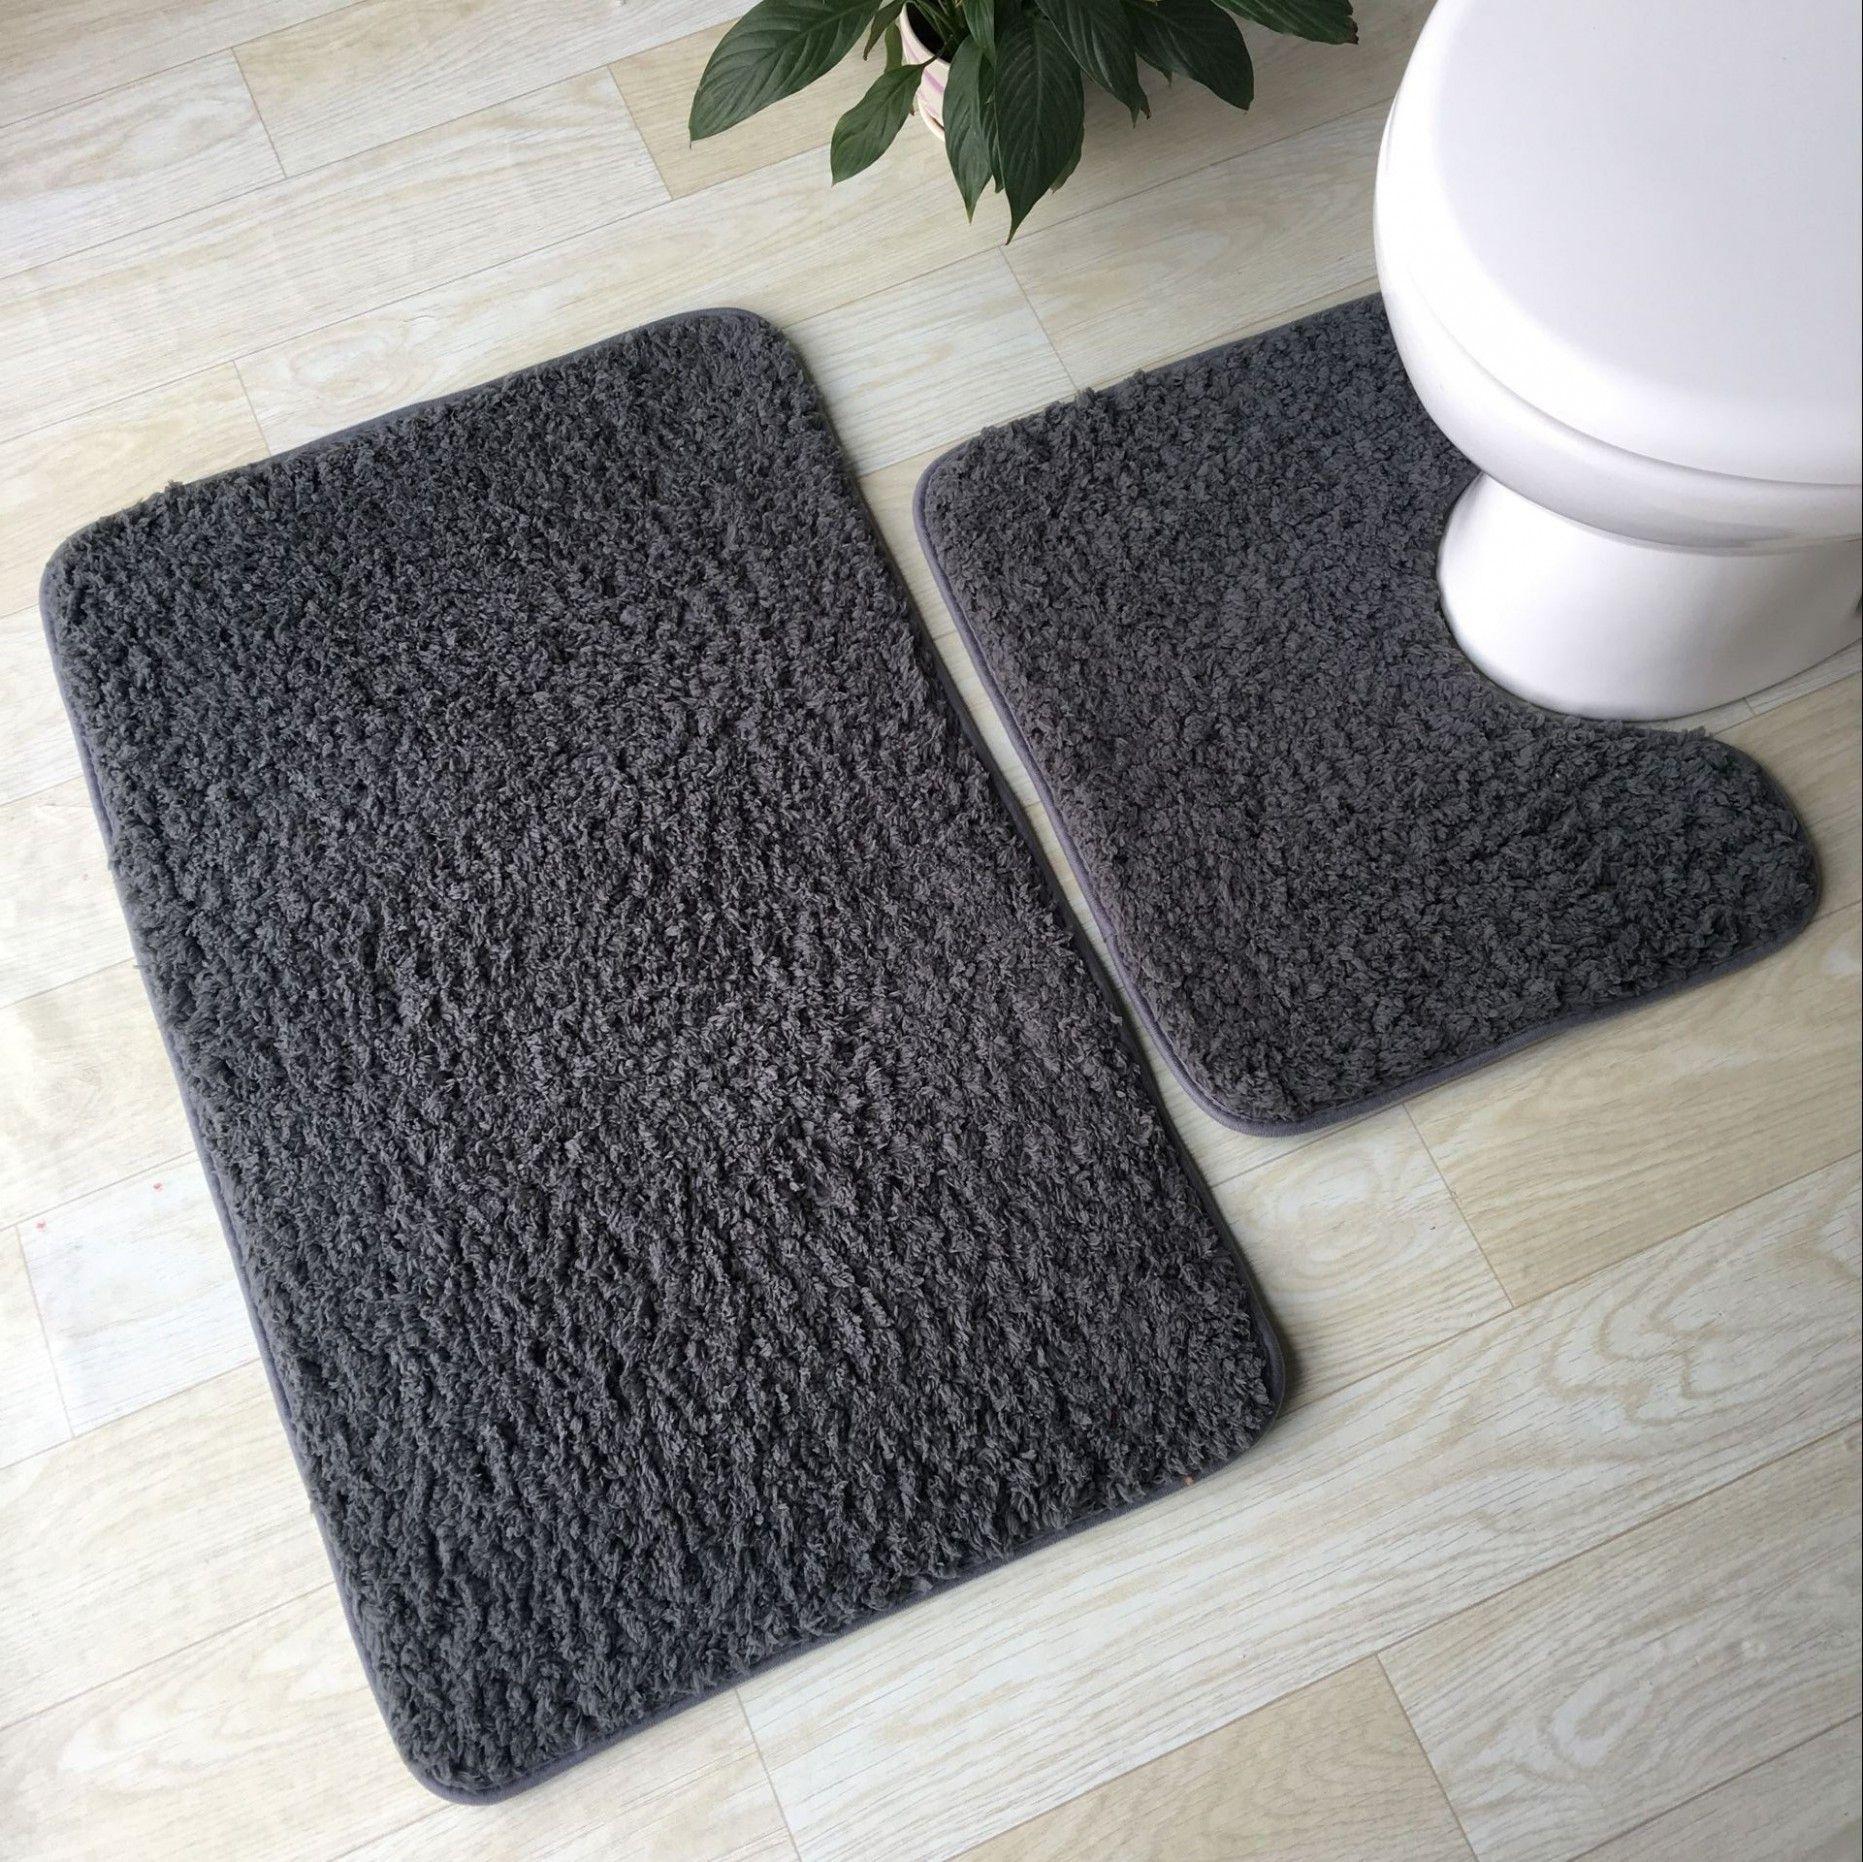 Pin Auf Trend Bathroom Rugs 2020 Bathroom Rugs Ideas